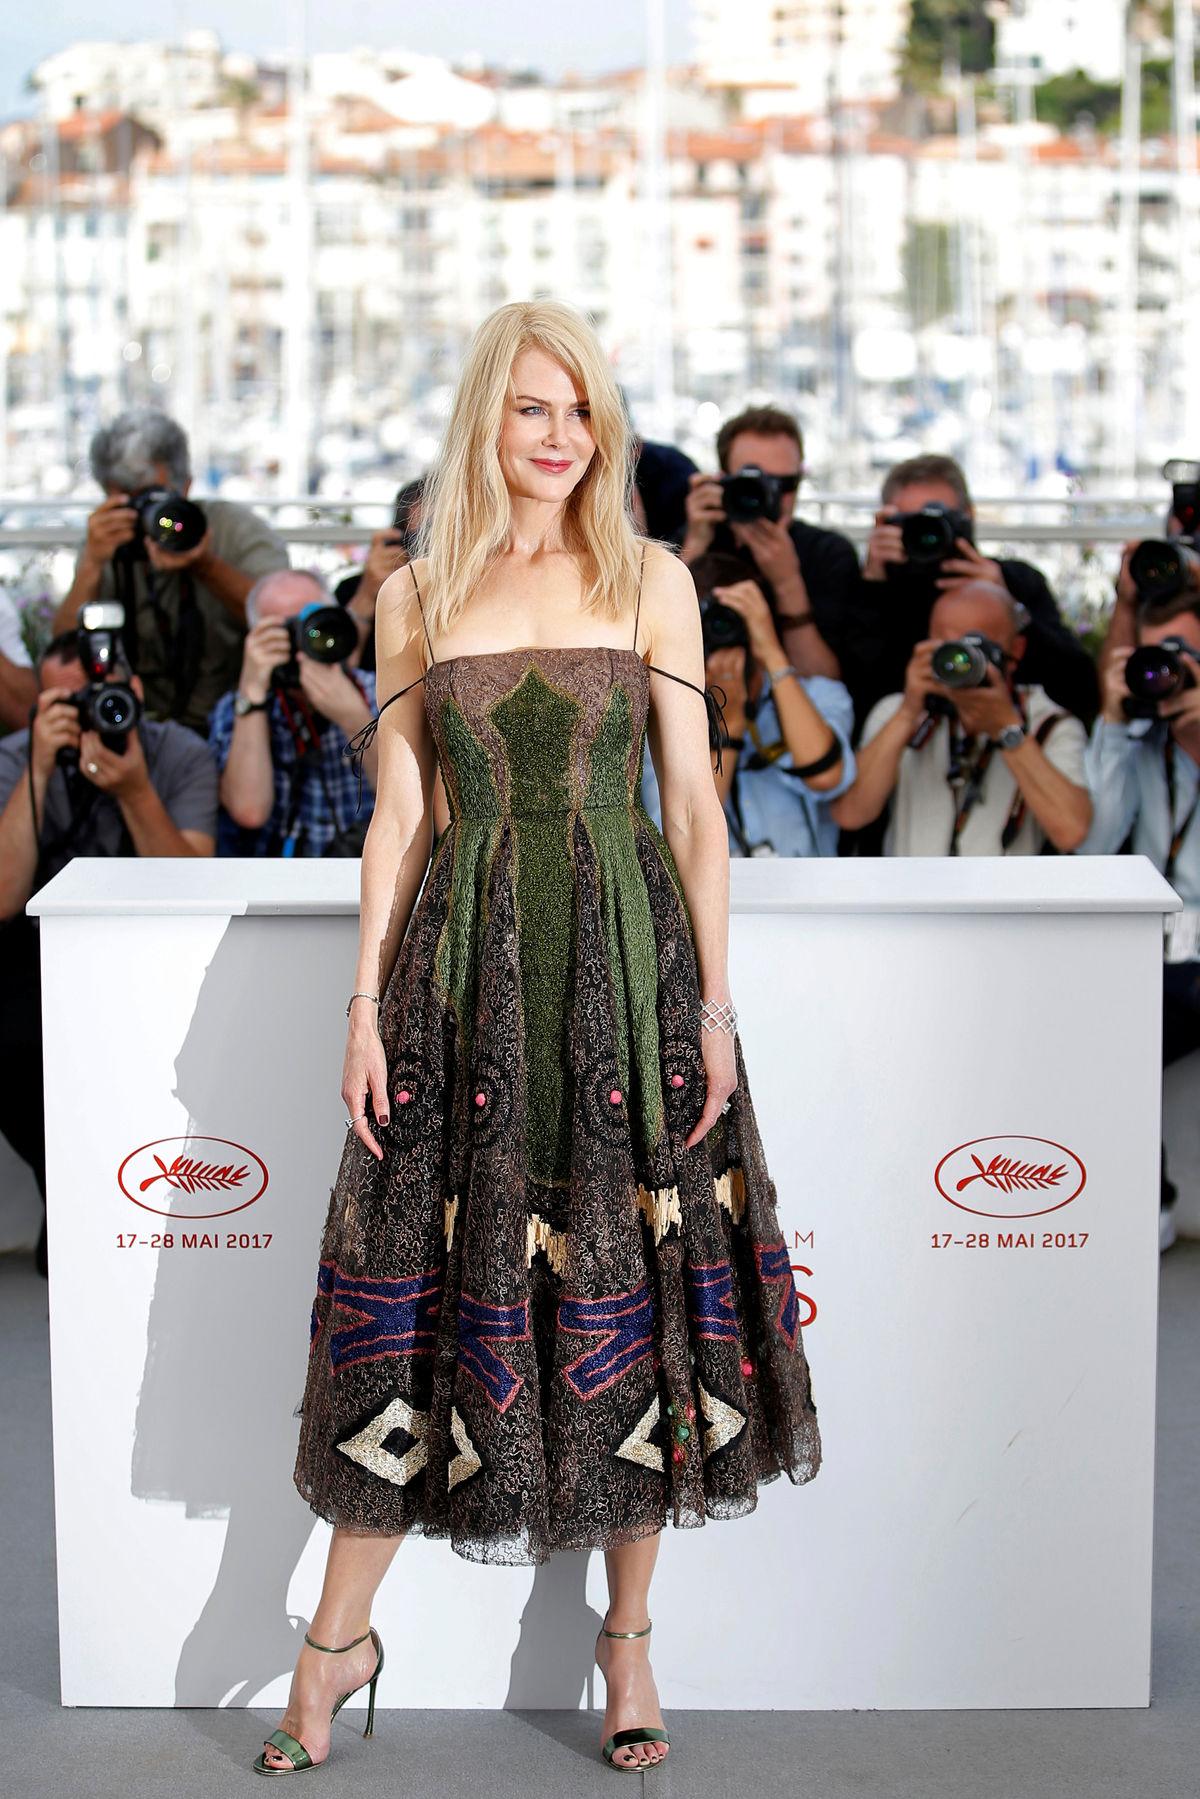 Herečka Nicole Kidman v kreácii Christian Dior Couture.